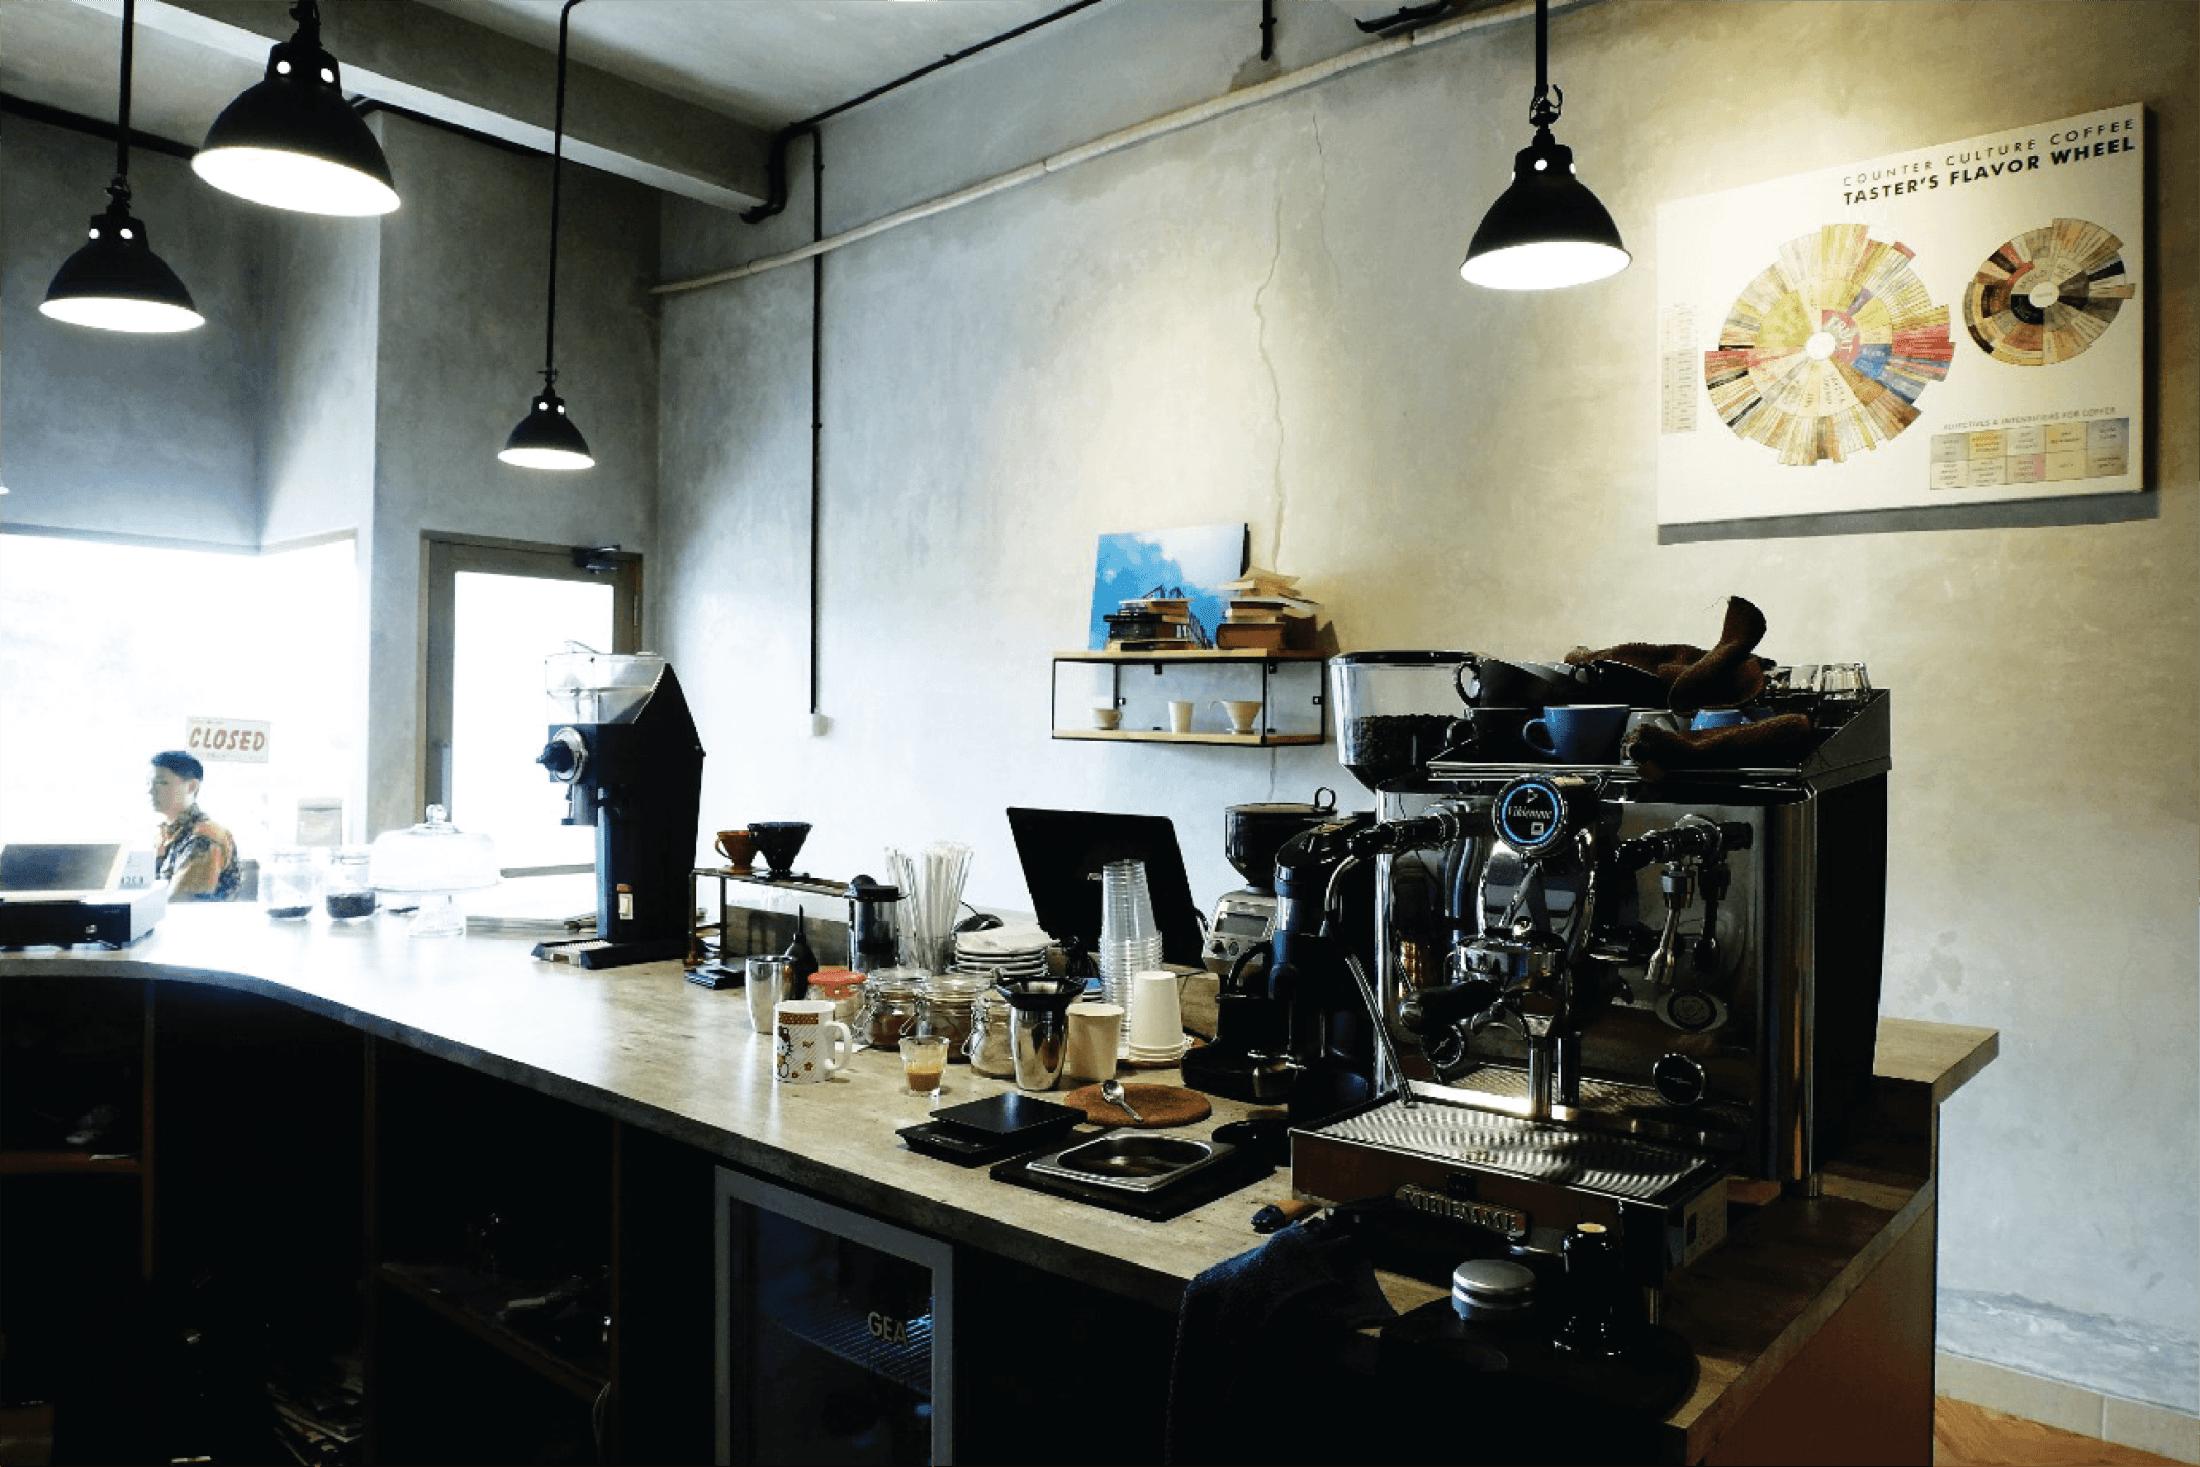 Sylvan Interior Design & Build Emmetropia Coffee Serpong, Kota Tangerang Selatan, Banten, Indonesia Serpong, Kota Tangerang Selatan, Banten, Indonesia Sylvan-Interior-Design-Build-Emmetropia-Coffee  83360